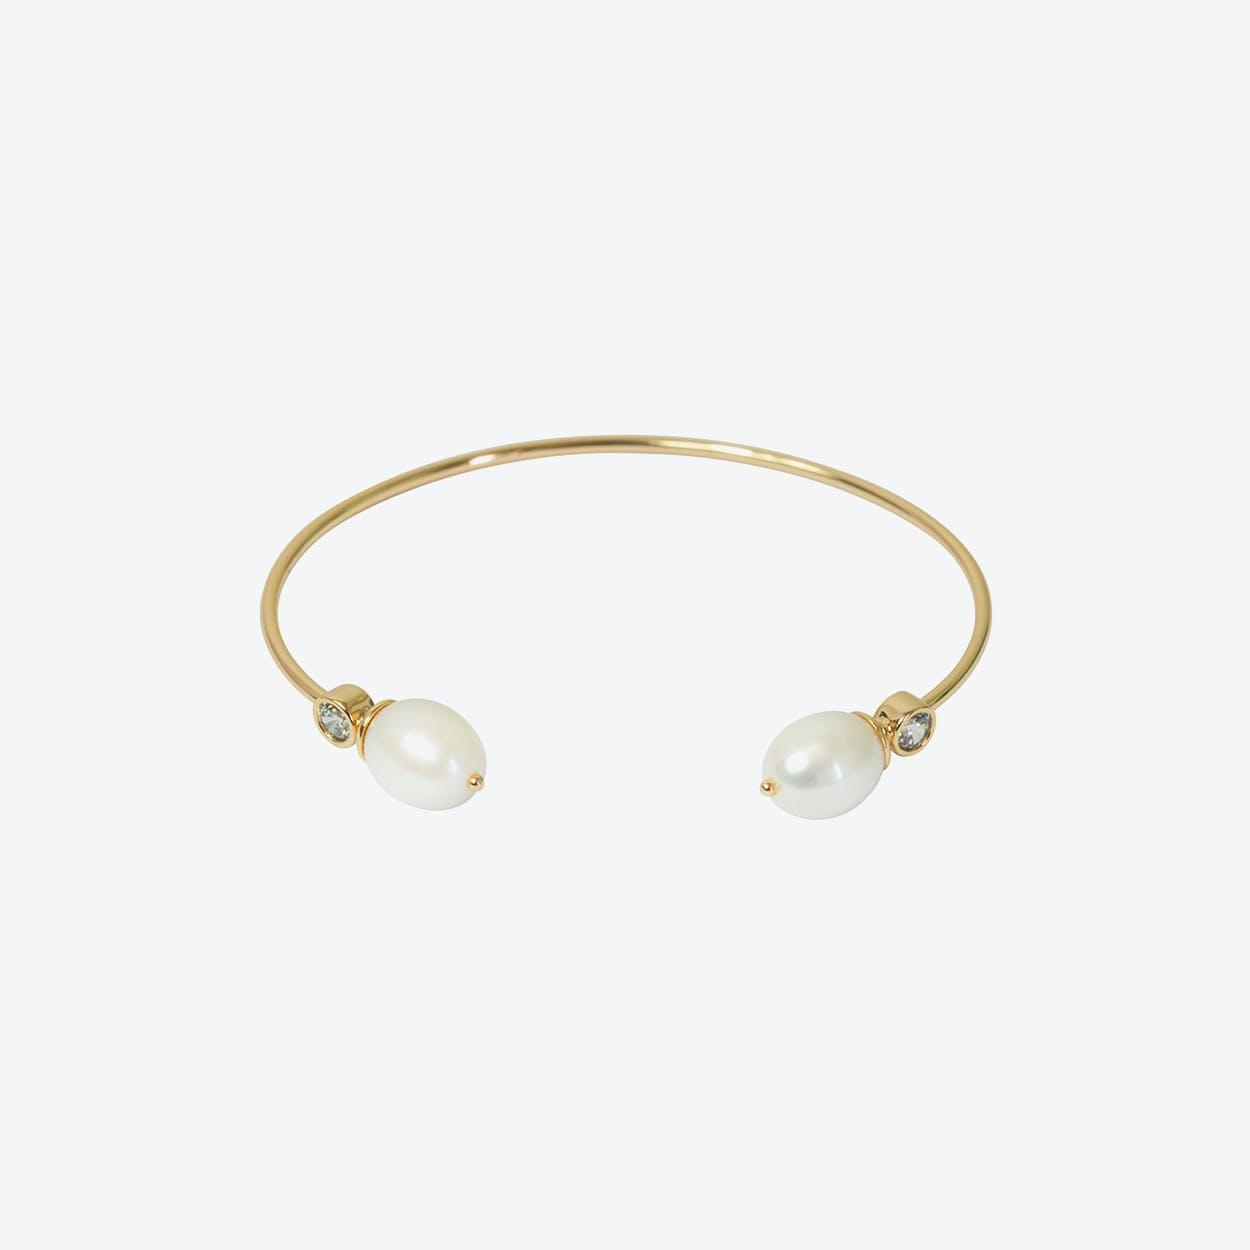 18k Gold Cultured Pearl Bangle